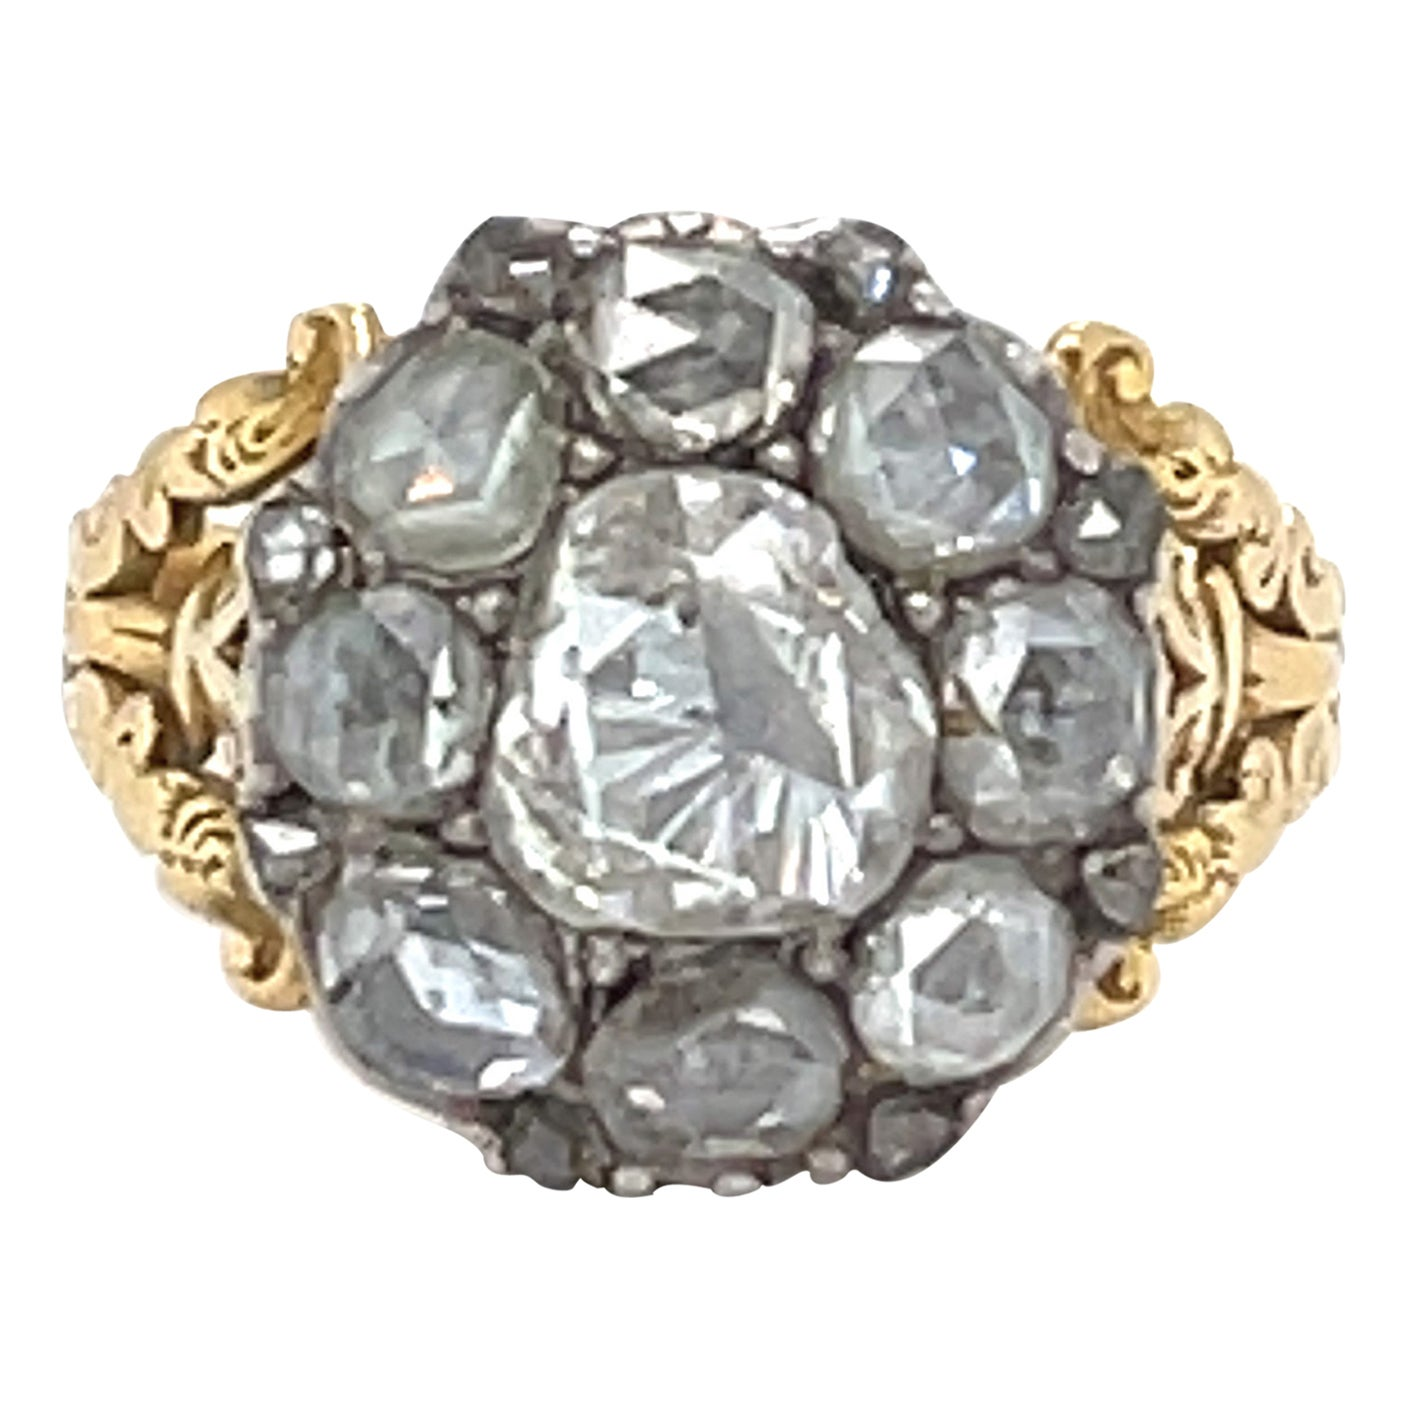 Antique Georgian 18 Karat Gold Rosecut Diamond Cluster Ring